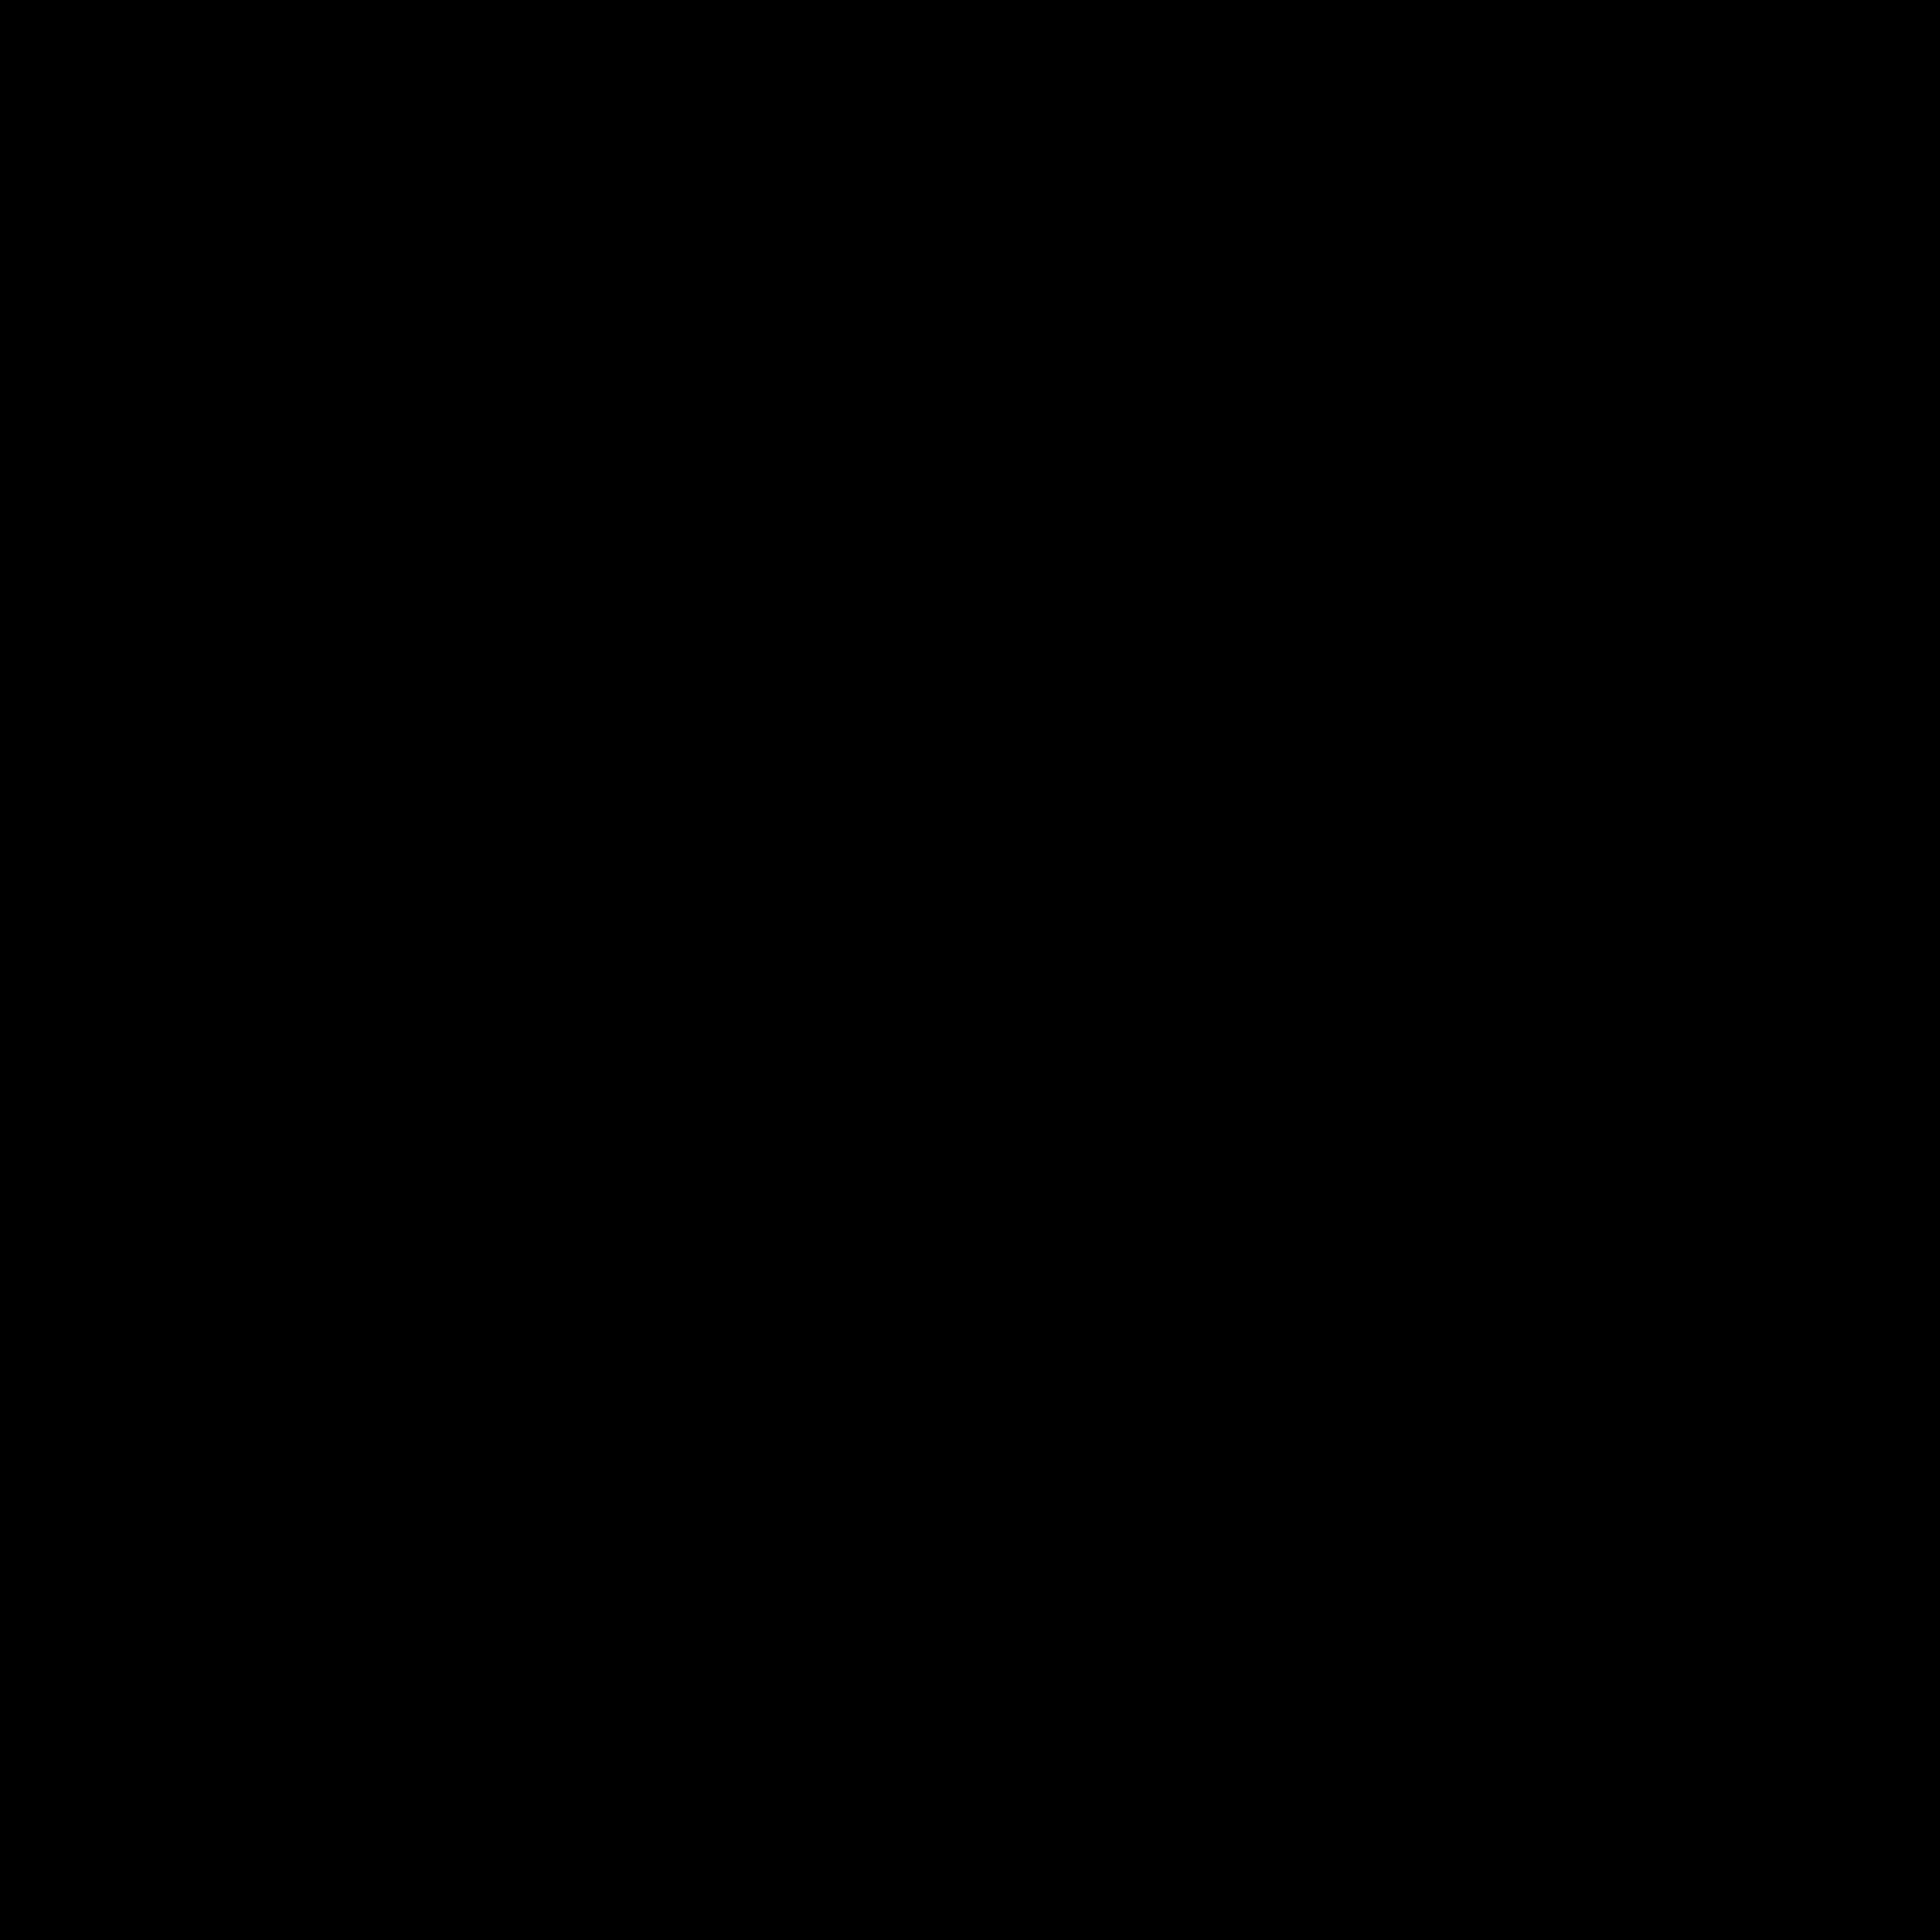 Kirby Logo PNG Transparent & SVG Vector.